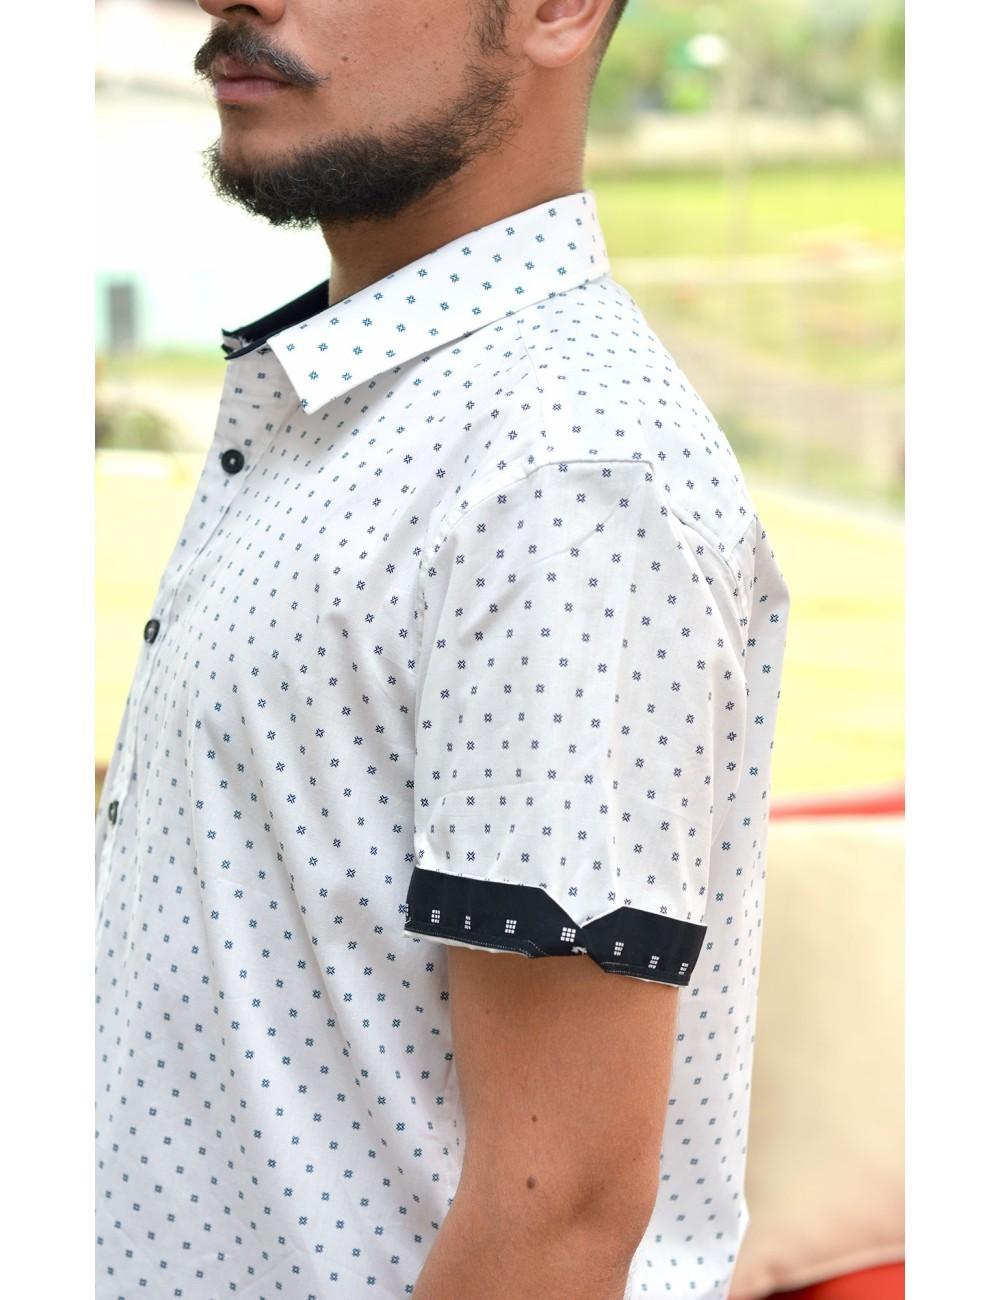 Camisa blanca manga corta estampado azul